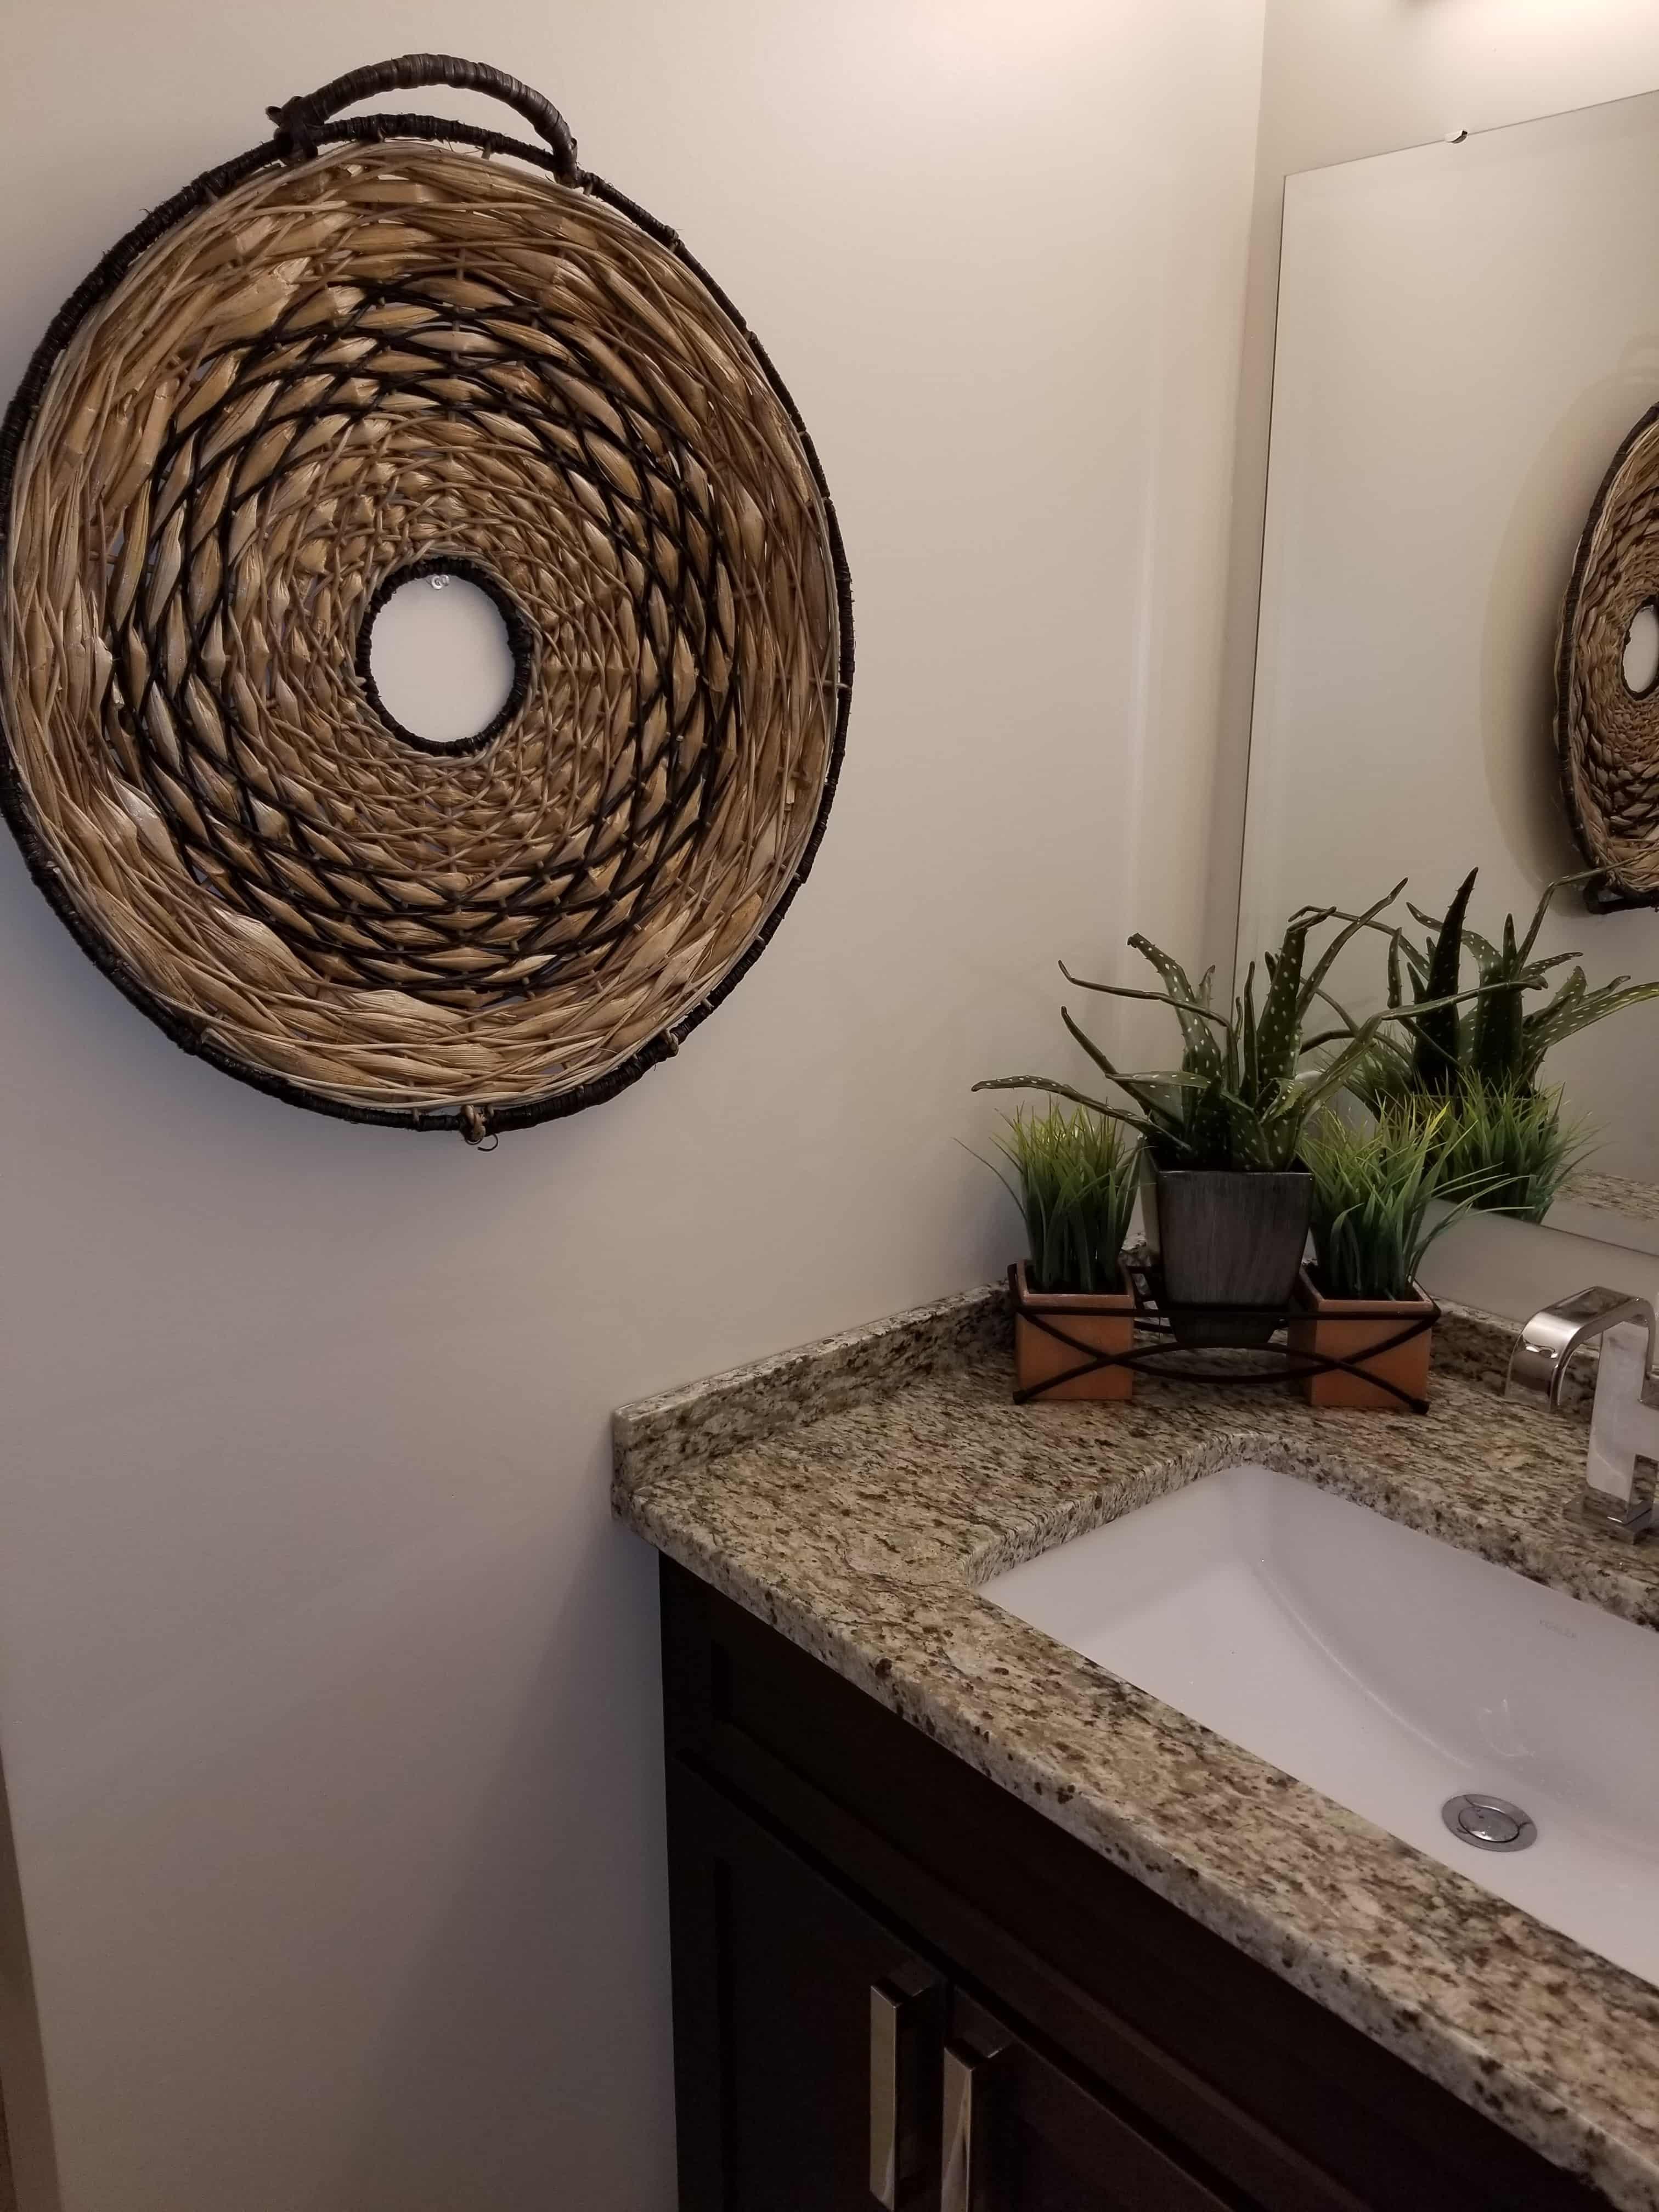 https://0201.nccdn.net/1_2/000/000/0c7/8dc/BathroomDesign-min-3024x4032.jpg